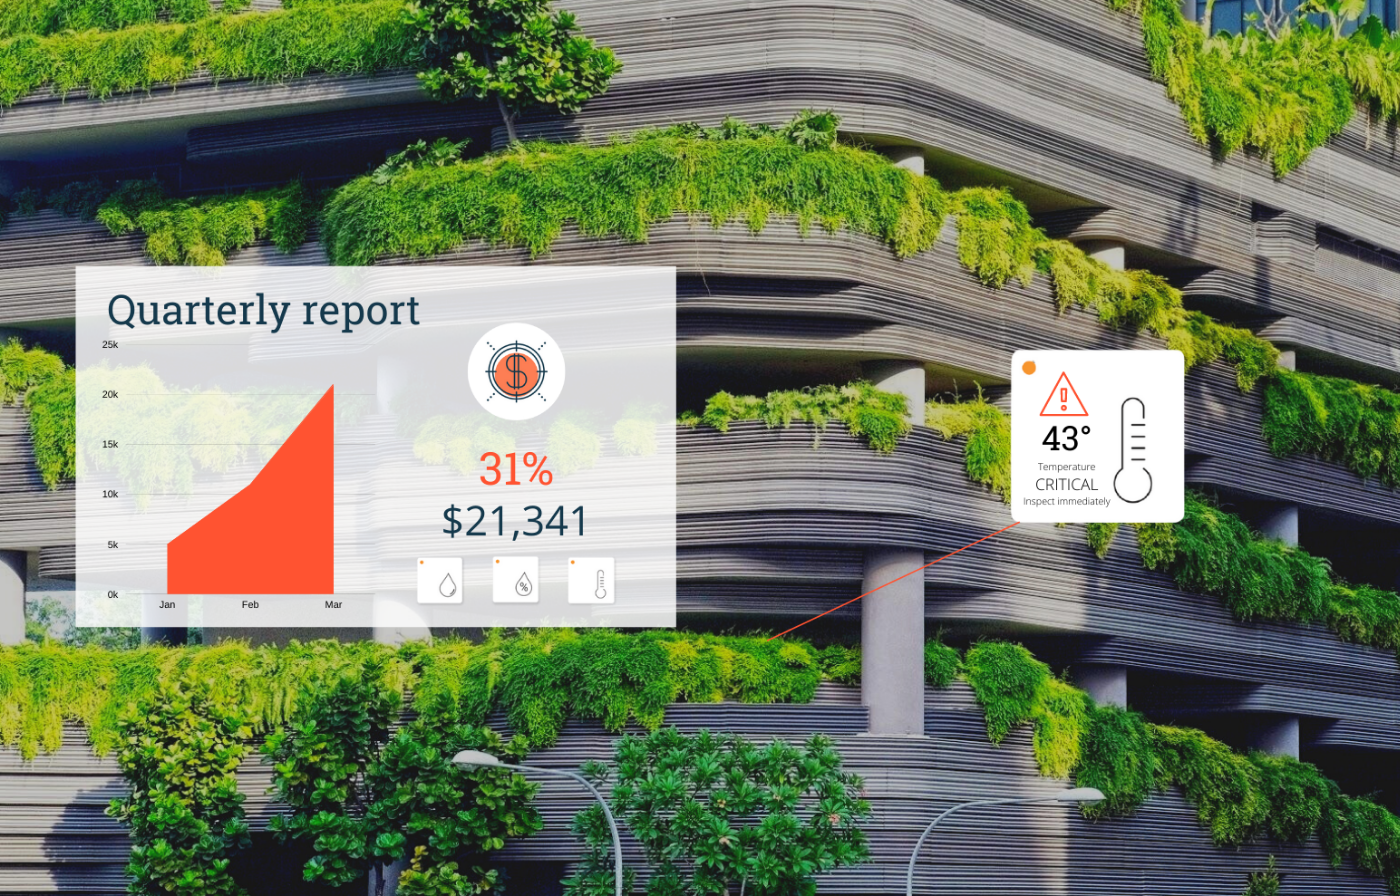 Sustainability disruptive technologies